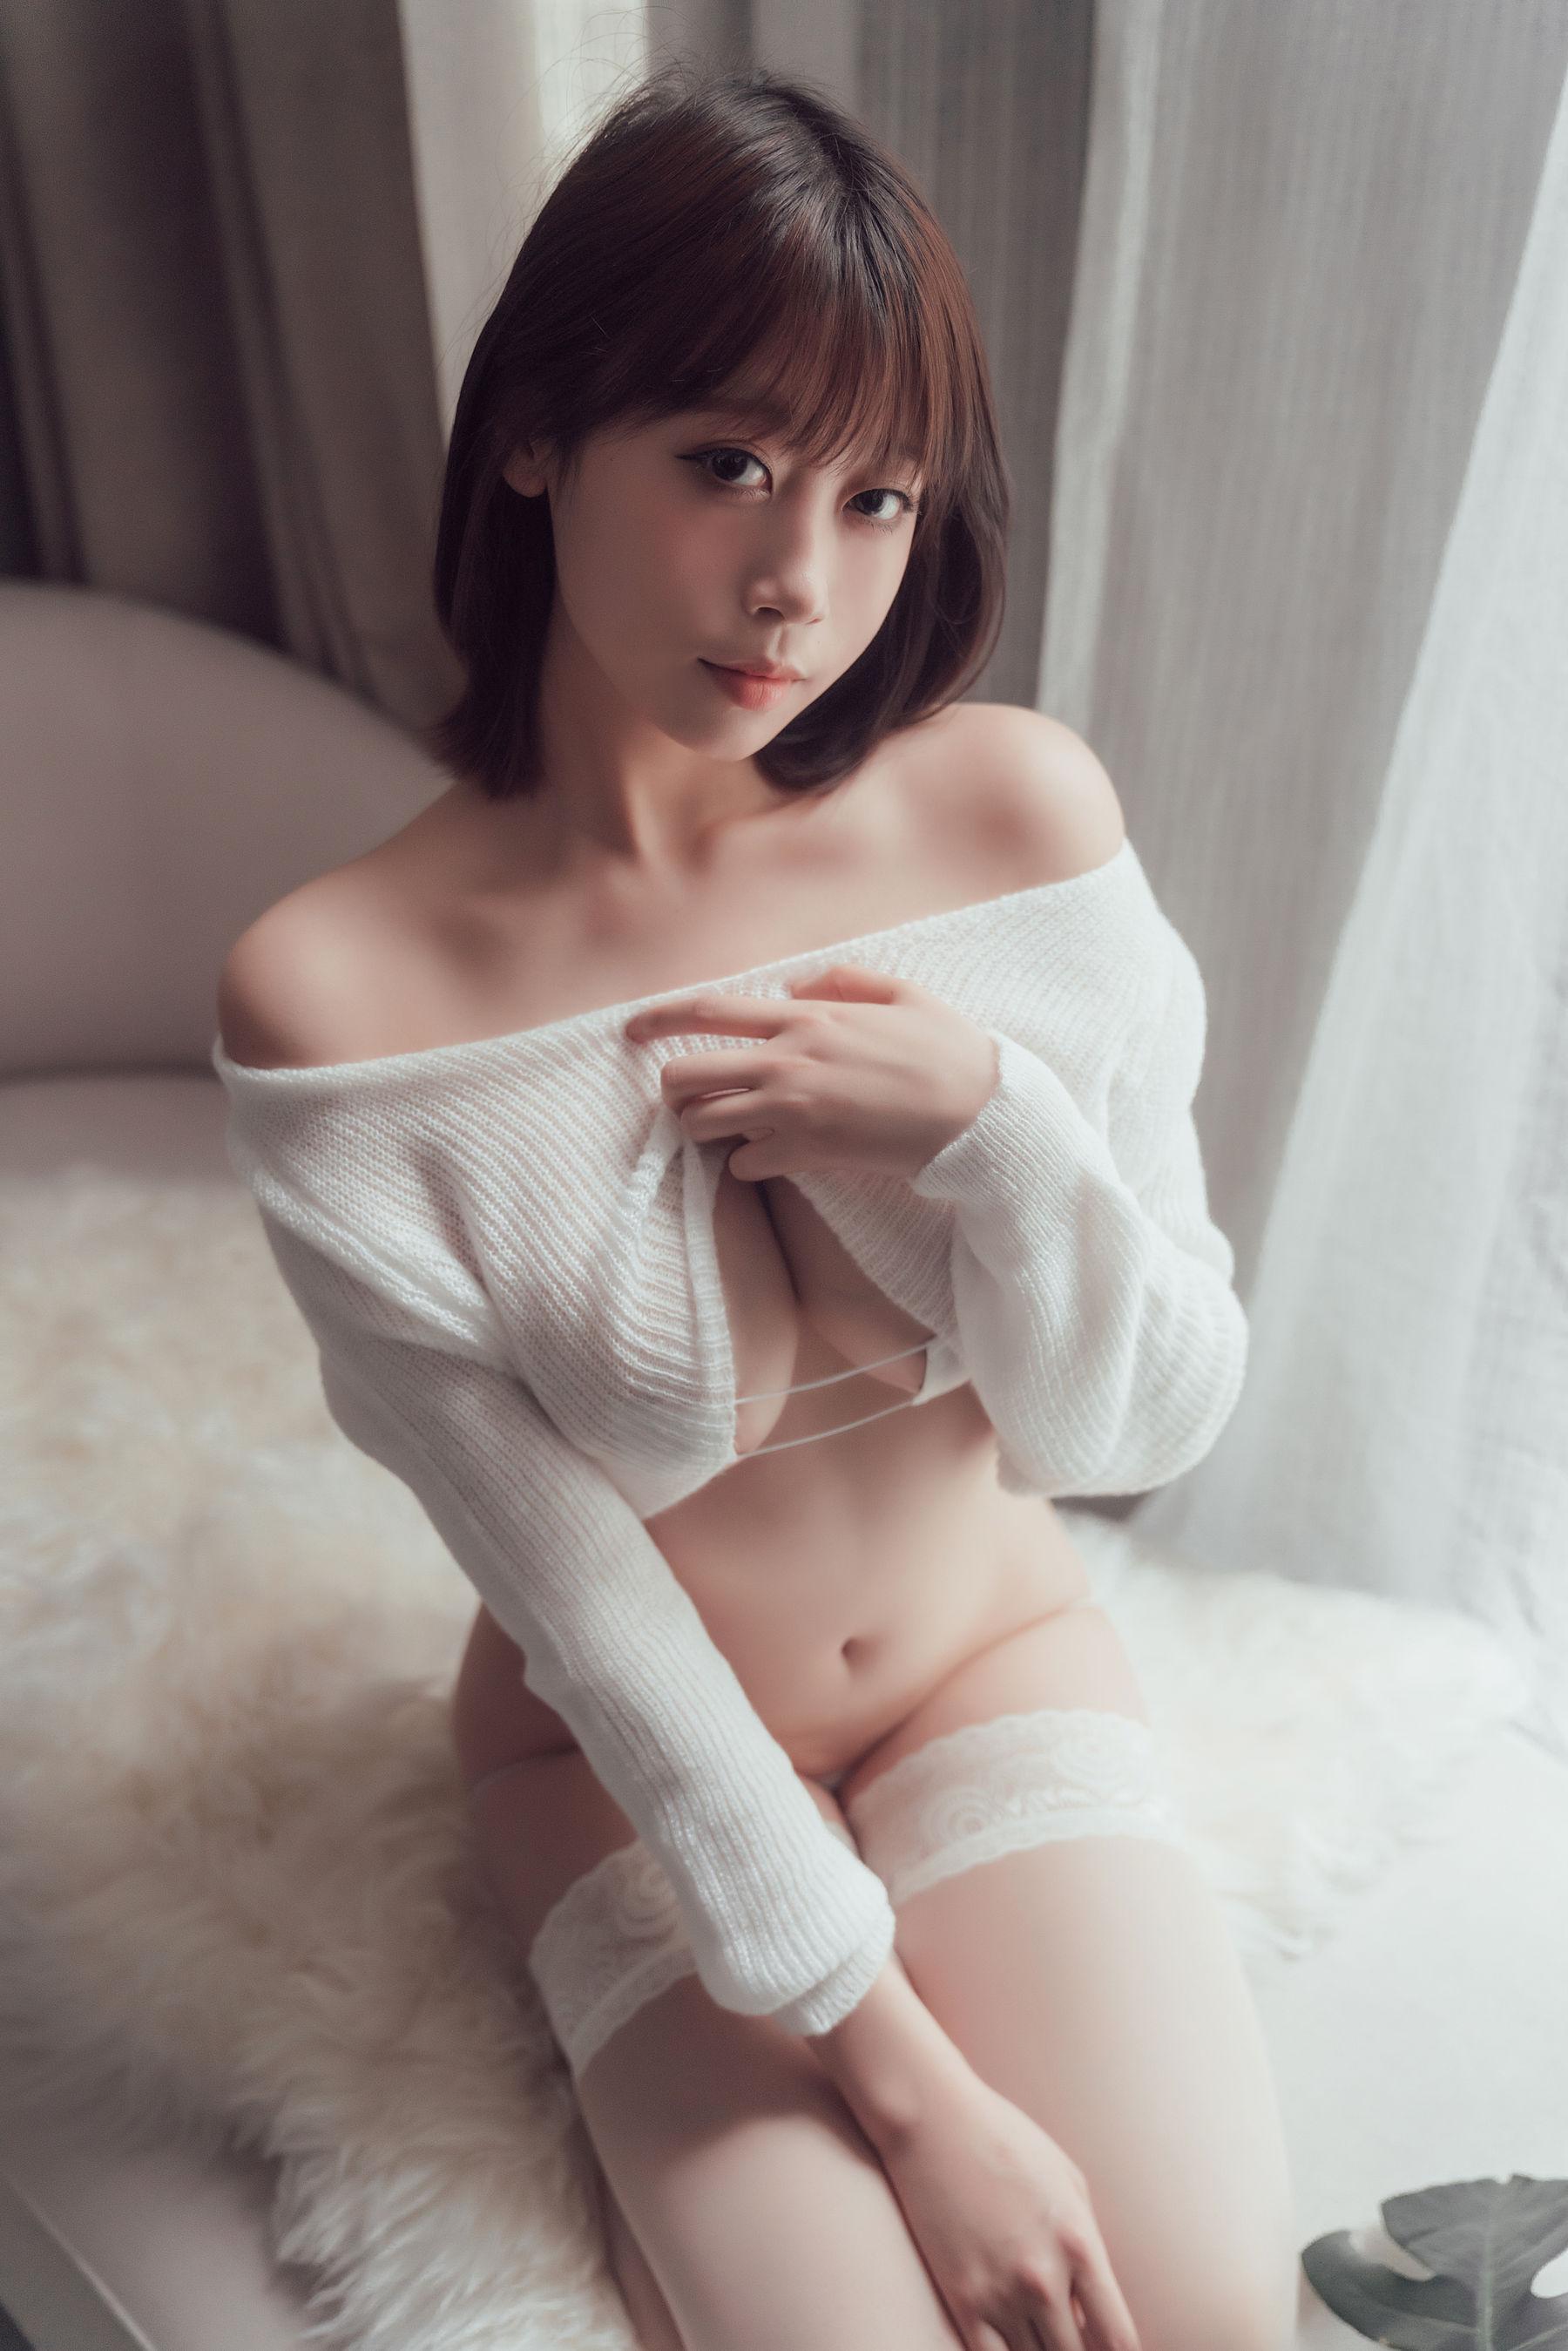 VOL.592 [网络美女]美乳性感少女情趣毛衣:奈汐酱(奈汐酱nice)超高清写真套图(32P)